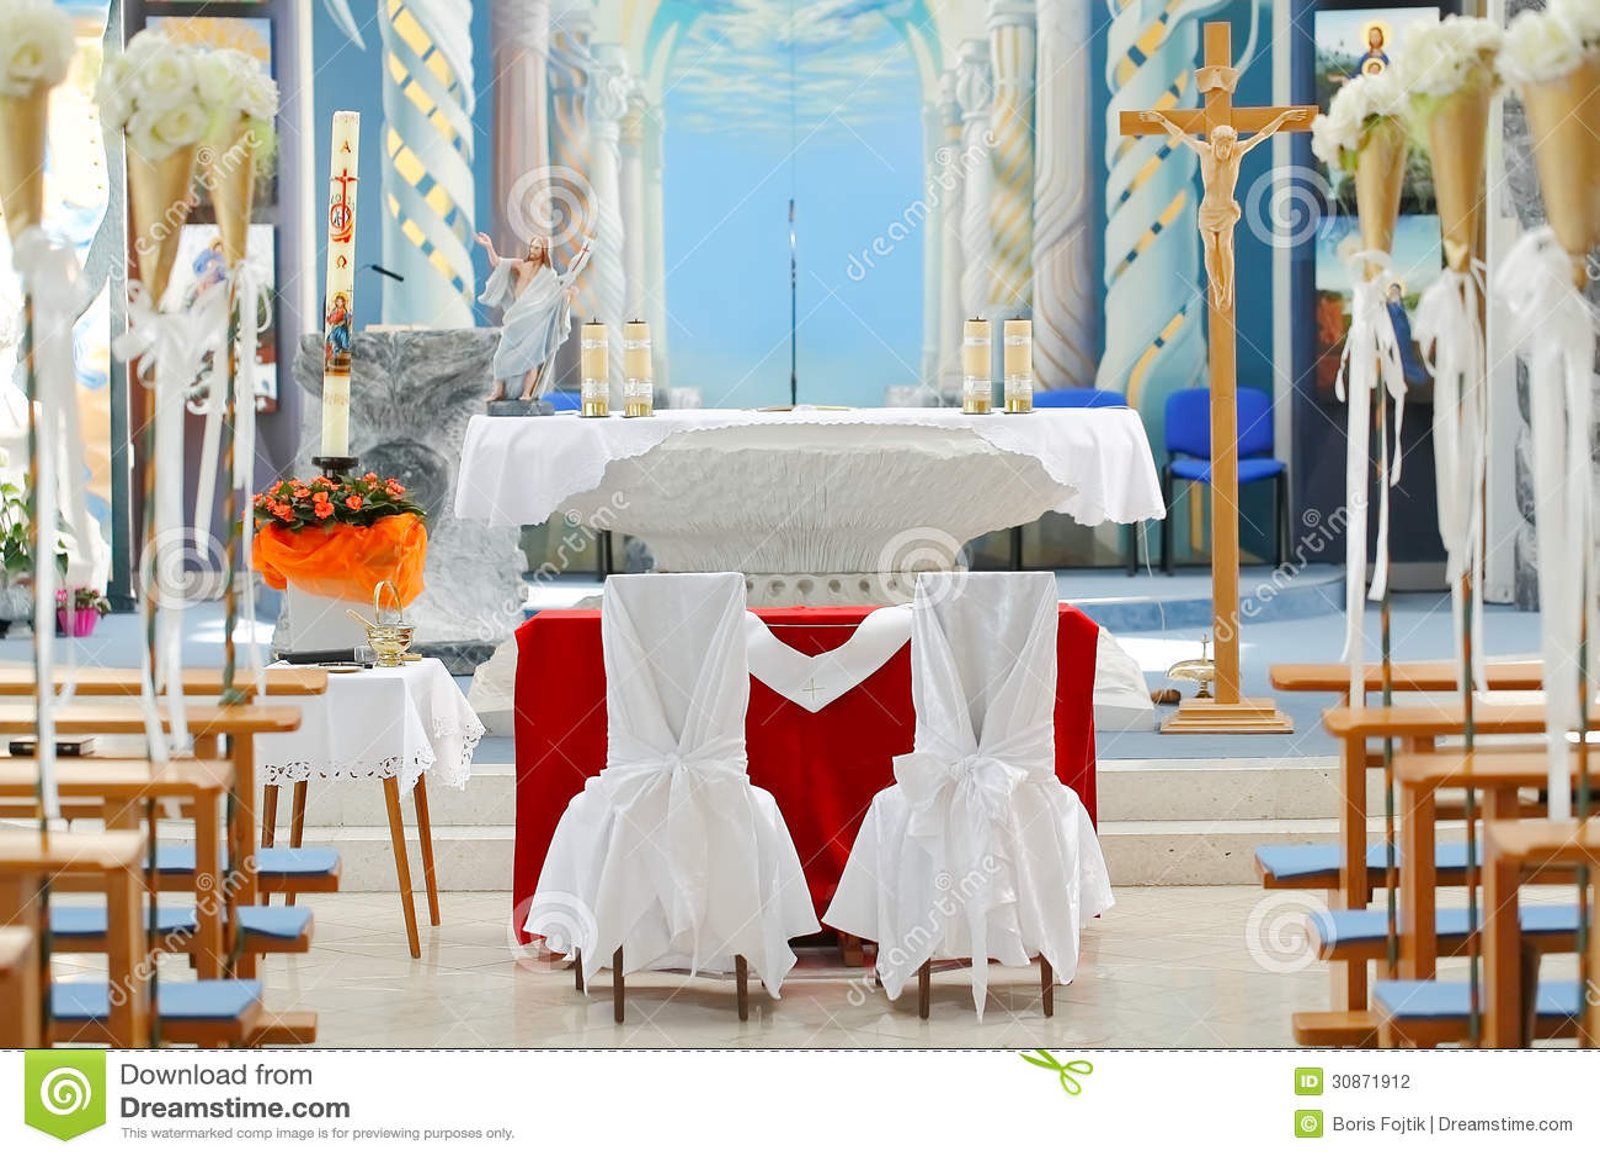 Wedding chairs in church